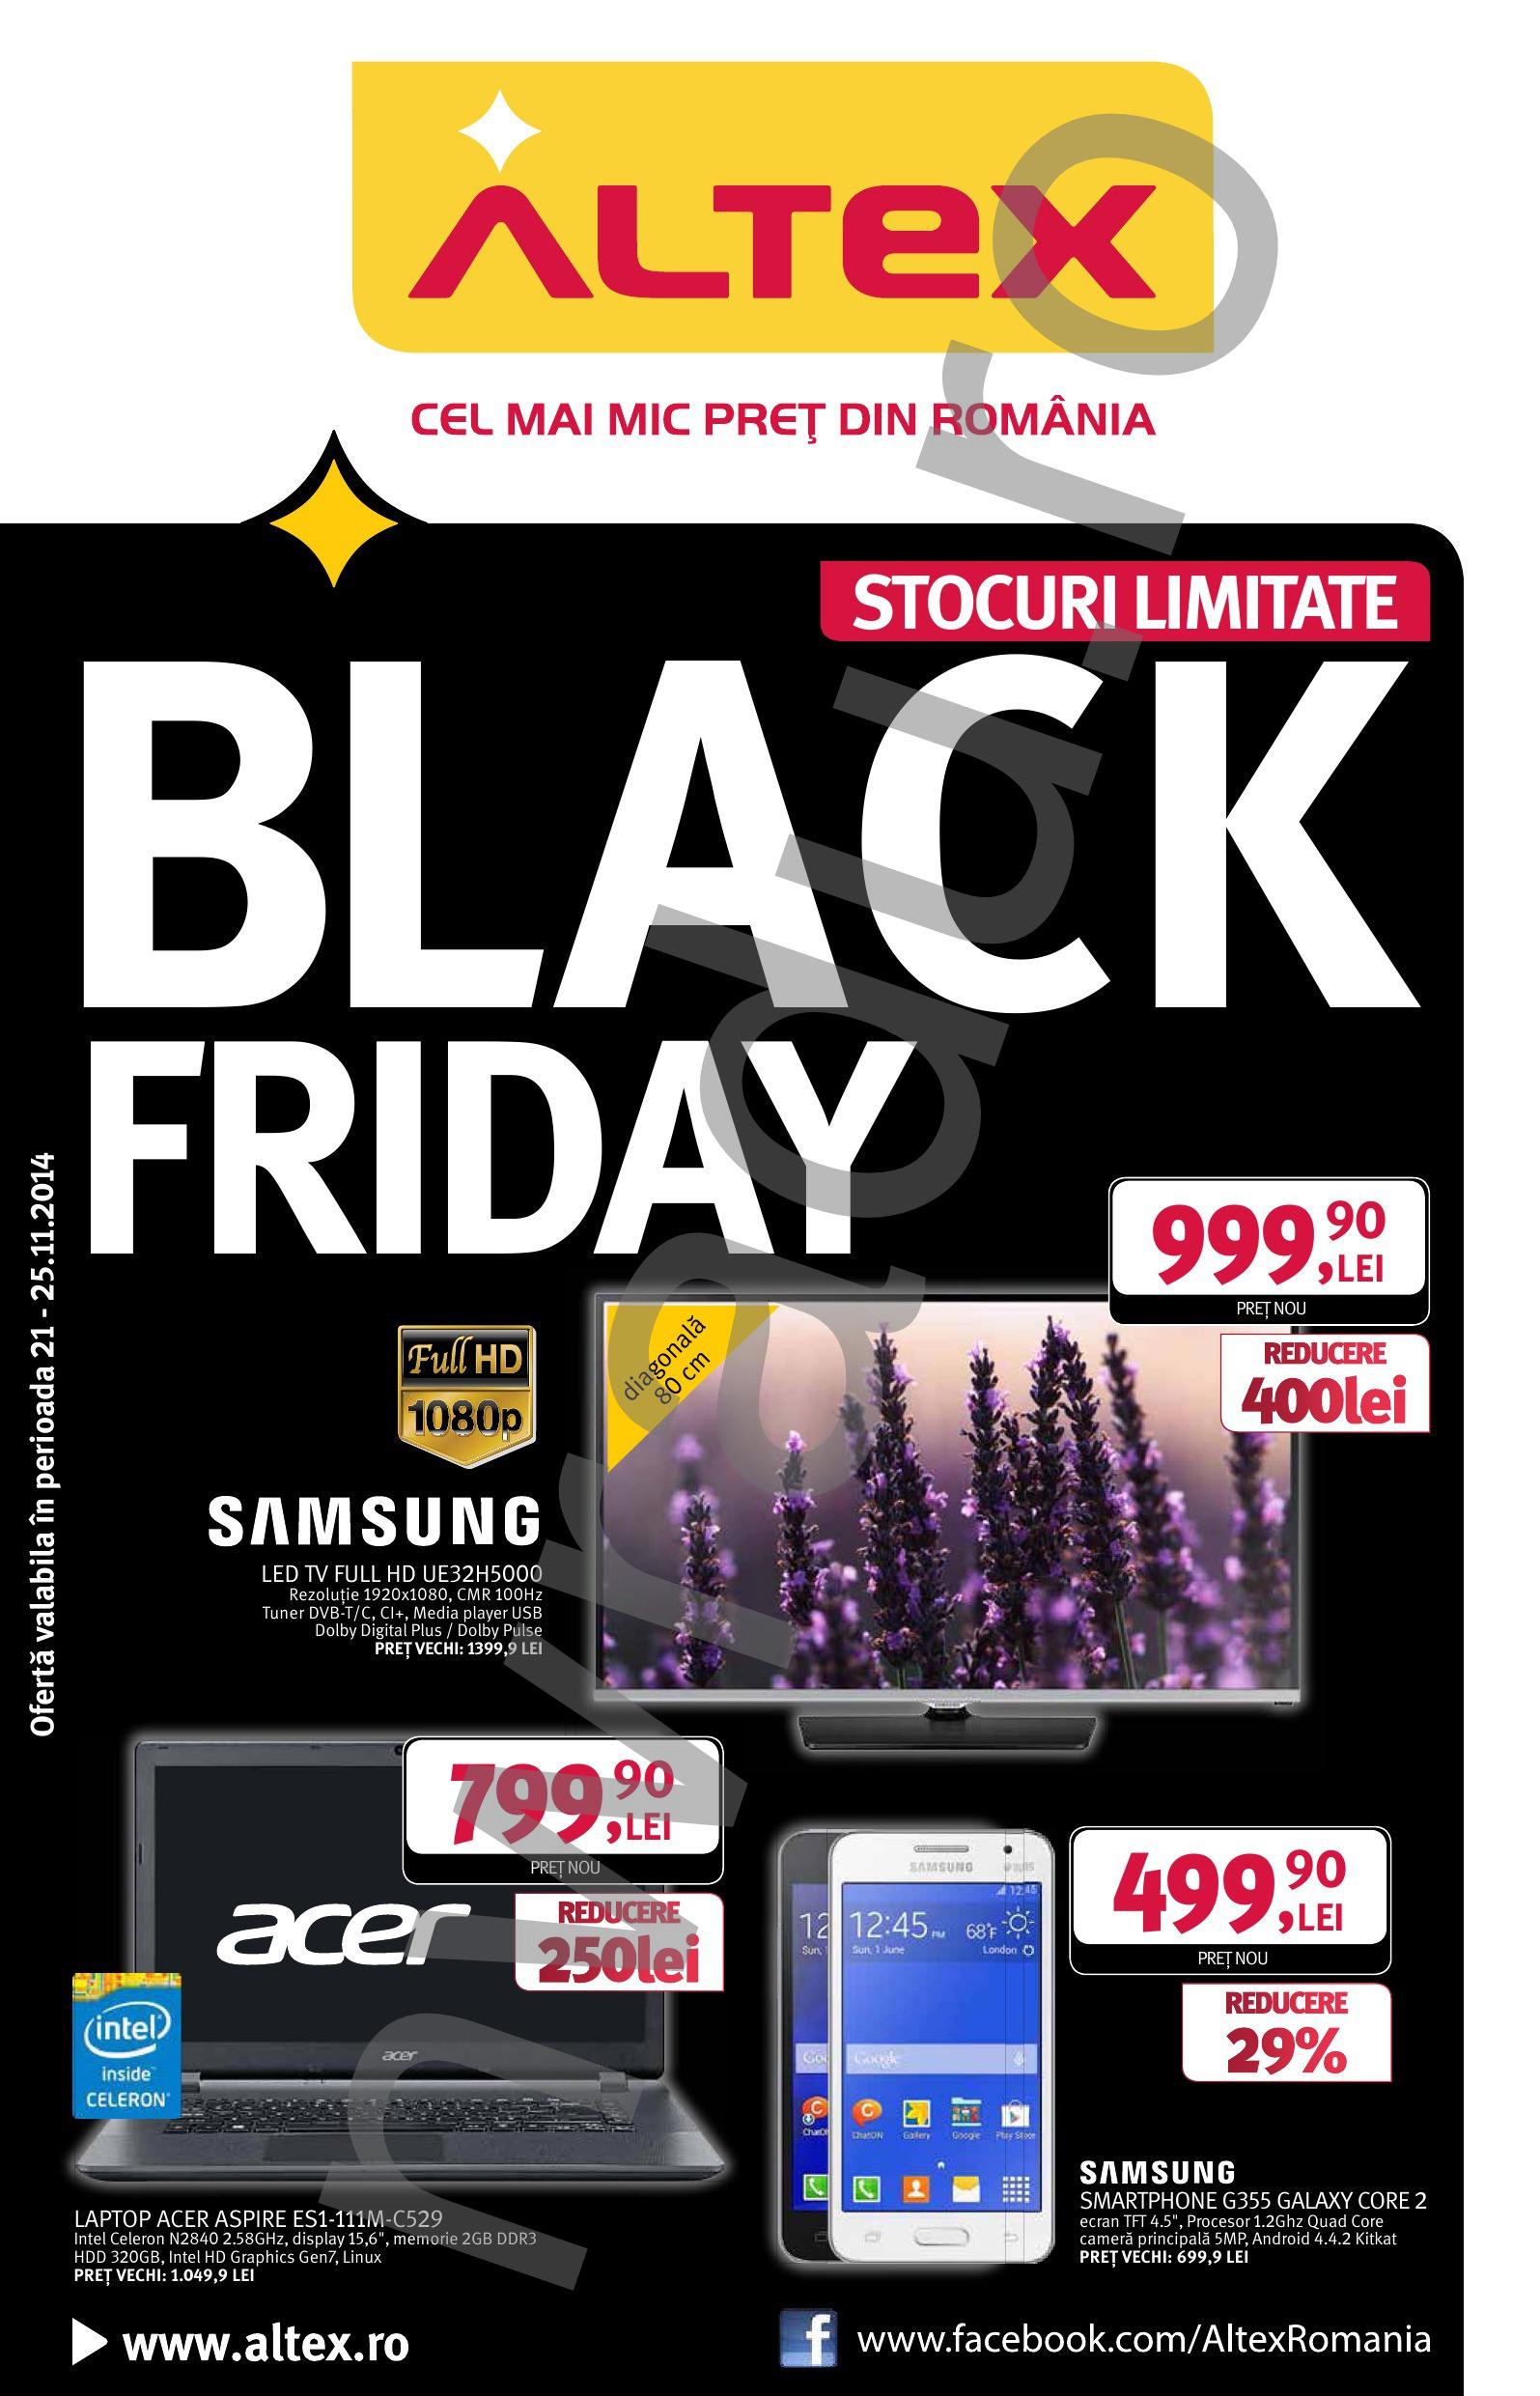 Black Friday ALTEX 22-14 noiembrie 2013 - Catalog oferte ...   Altex Black Friday